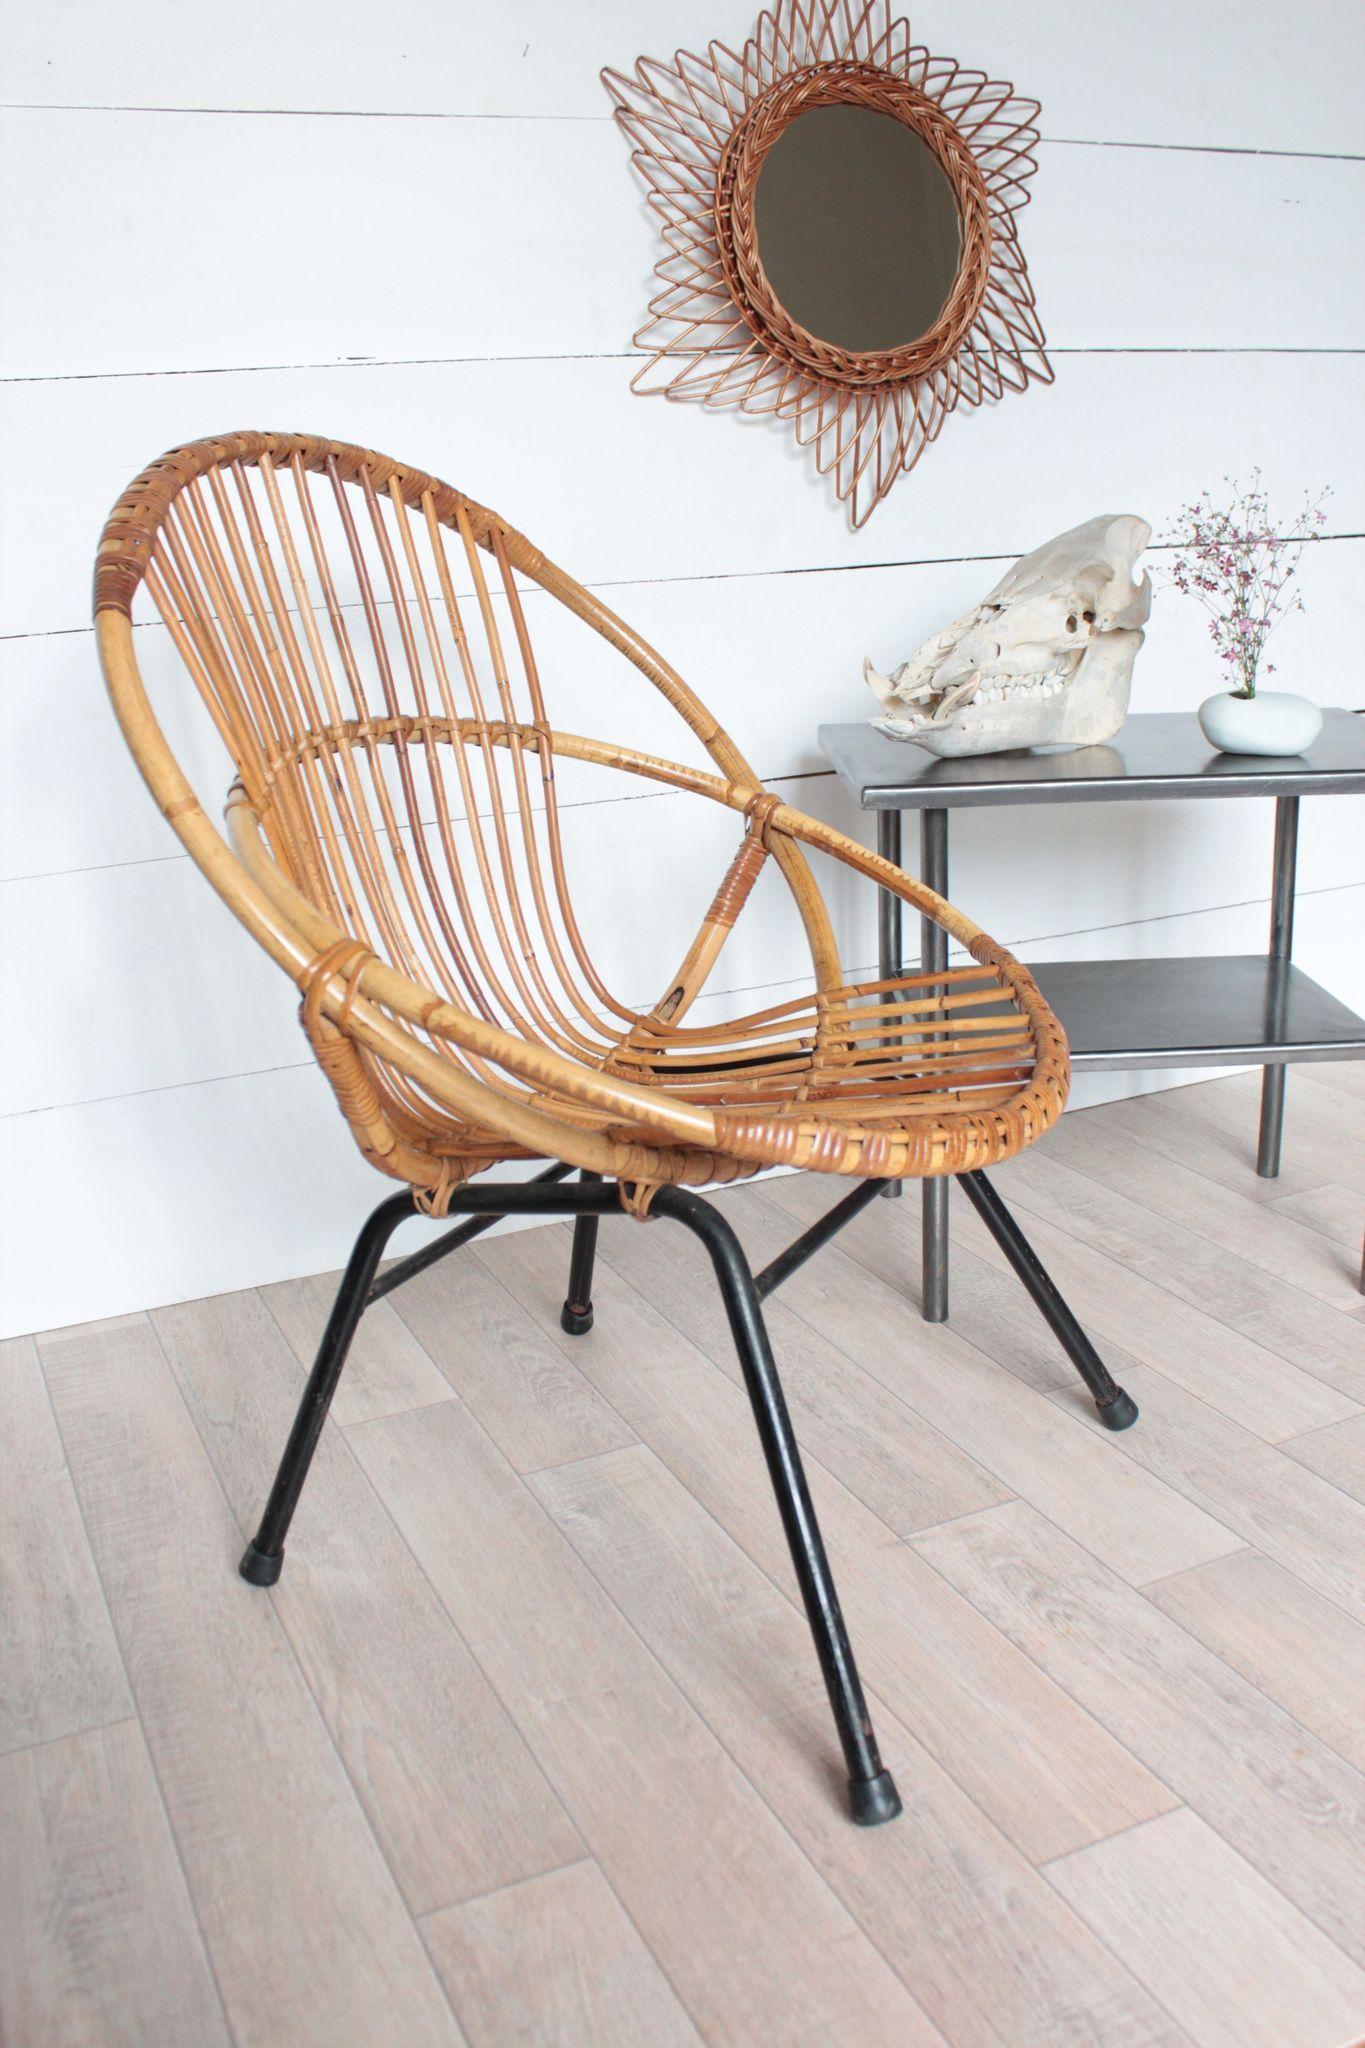 fauteuil coquille vintage en rotin adulte Trendy Little 1   My ...